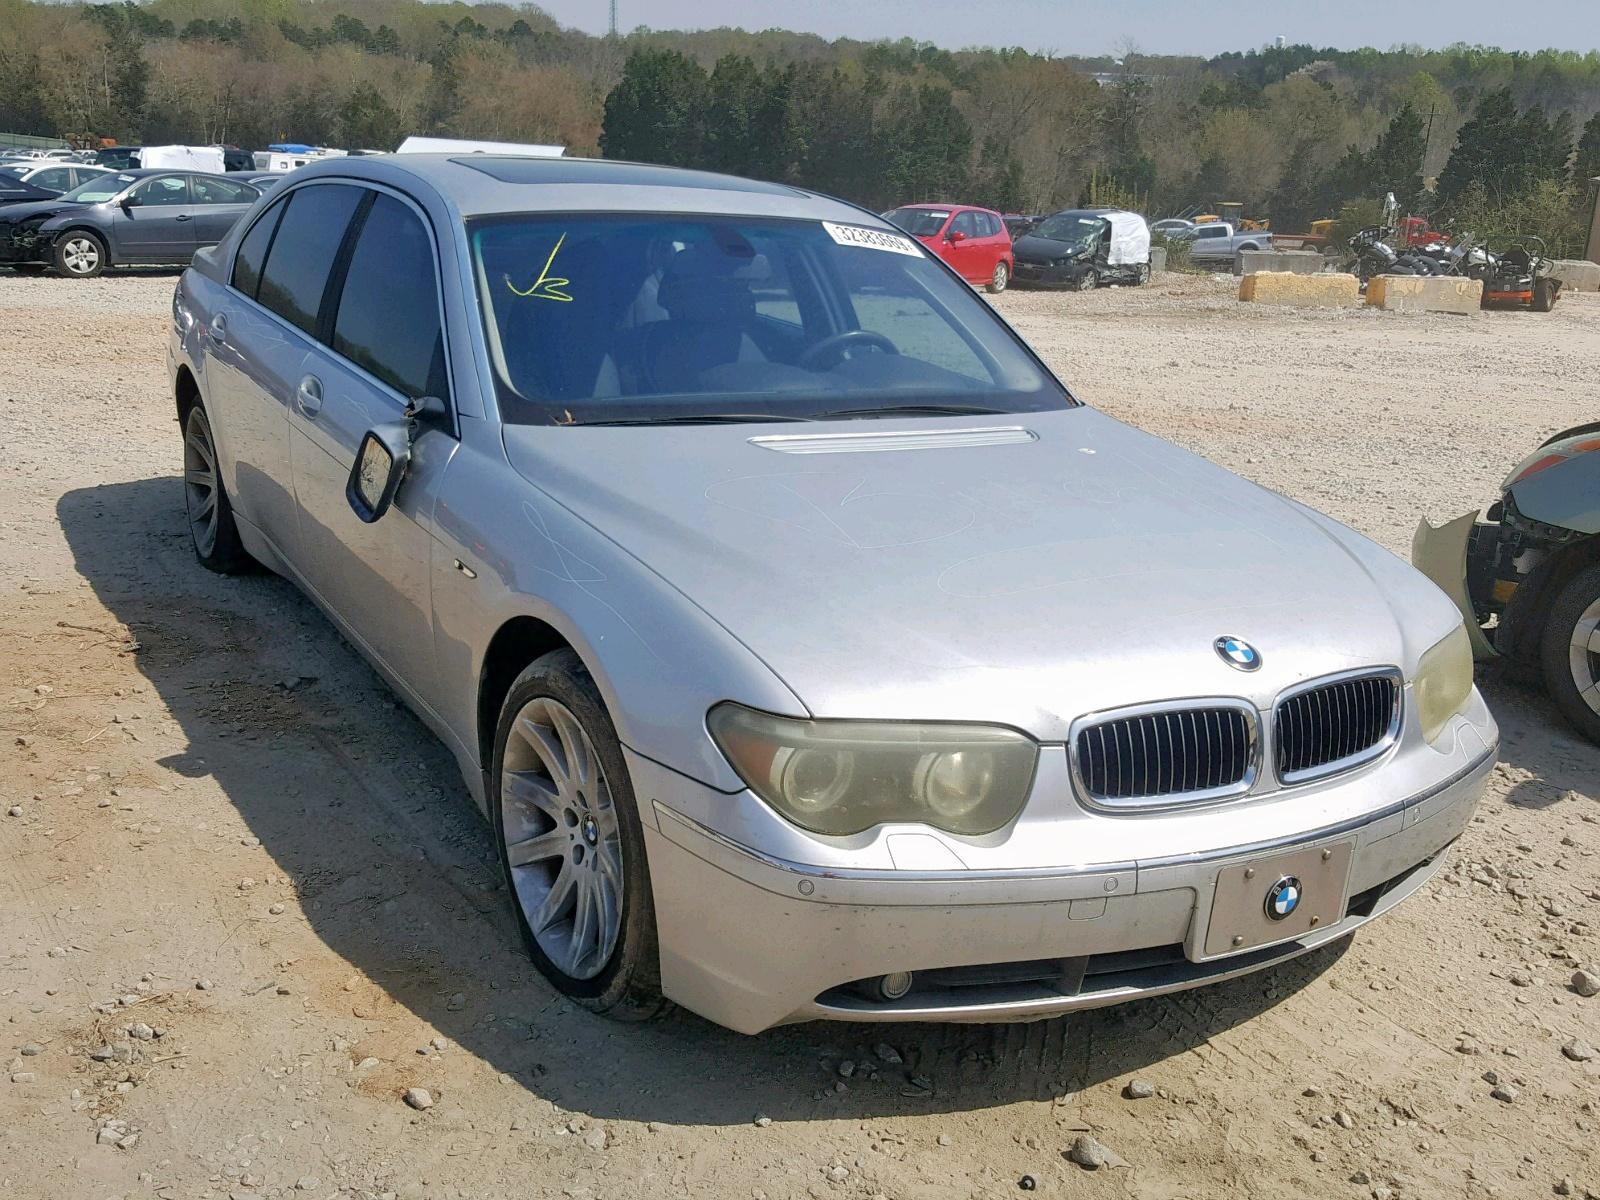 Salvage 2003 BMW 745 LI for sale